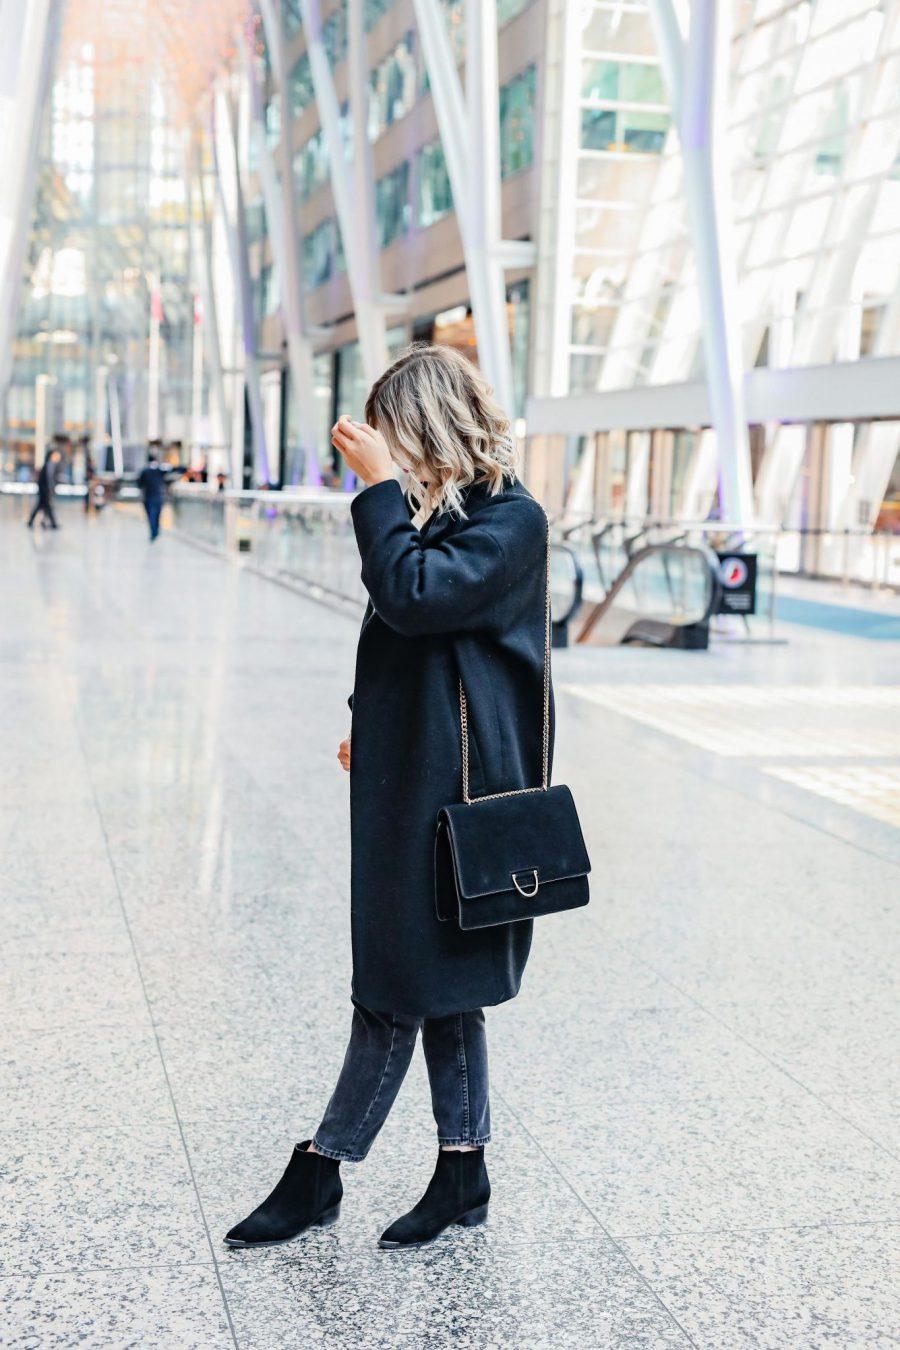 Best Winter Coats For Women 2020-2021 | B2B Fashion